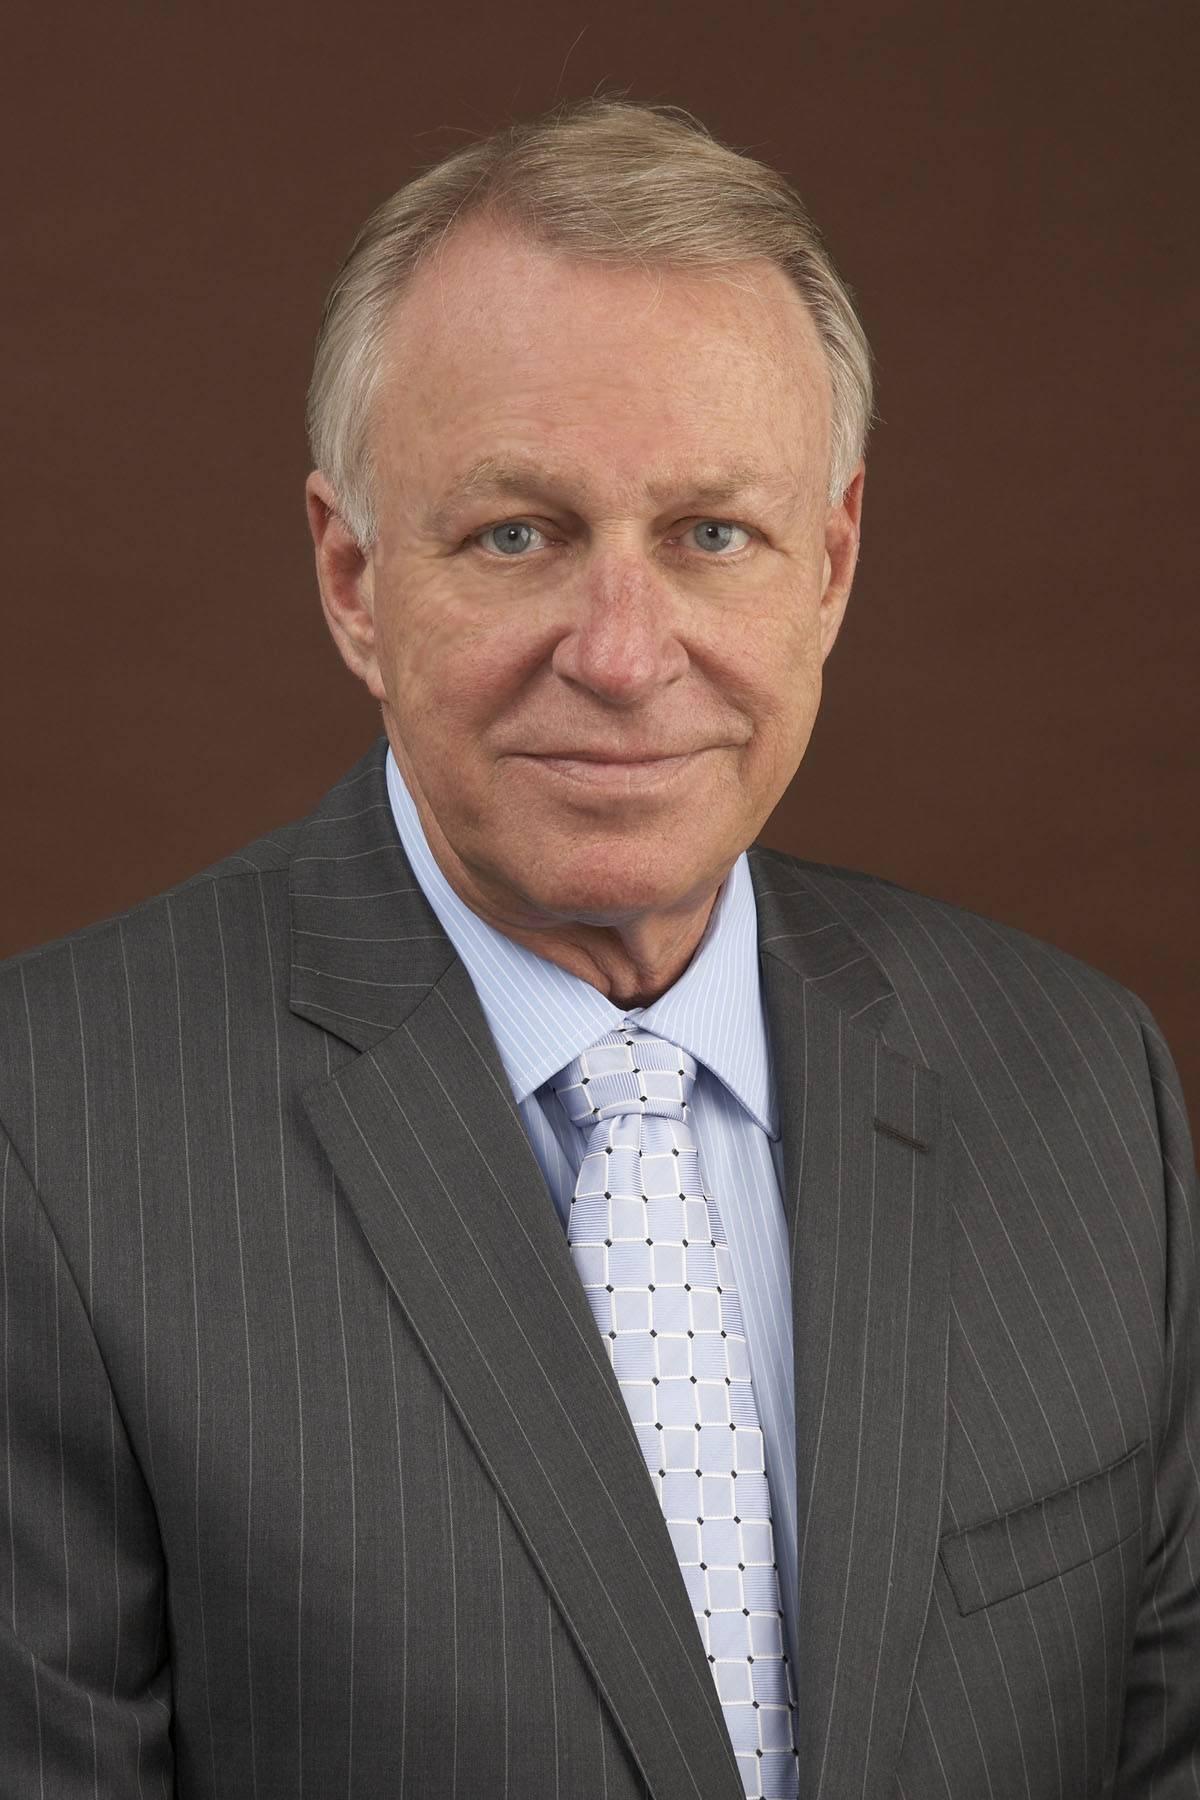 north carolina auto dealer david westcott to lead nada in 2013 digital dealer digital dealer